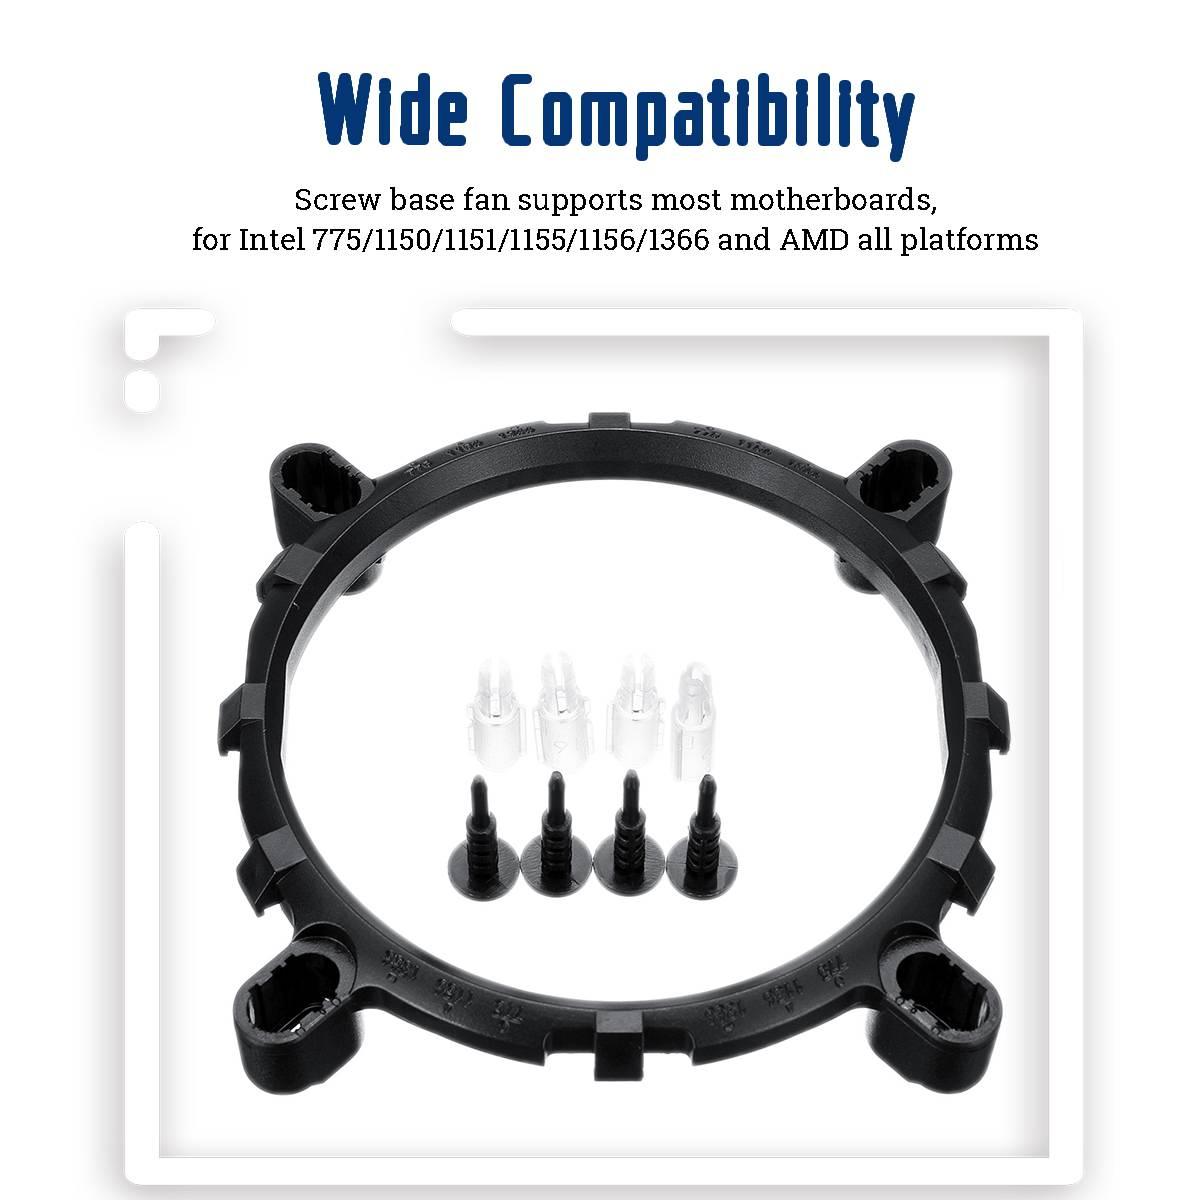 6 Heat Pipe CPU Heatsink for Intel 775/1150/1151/1155/1156/1366 and All AMD 7